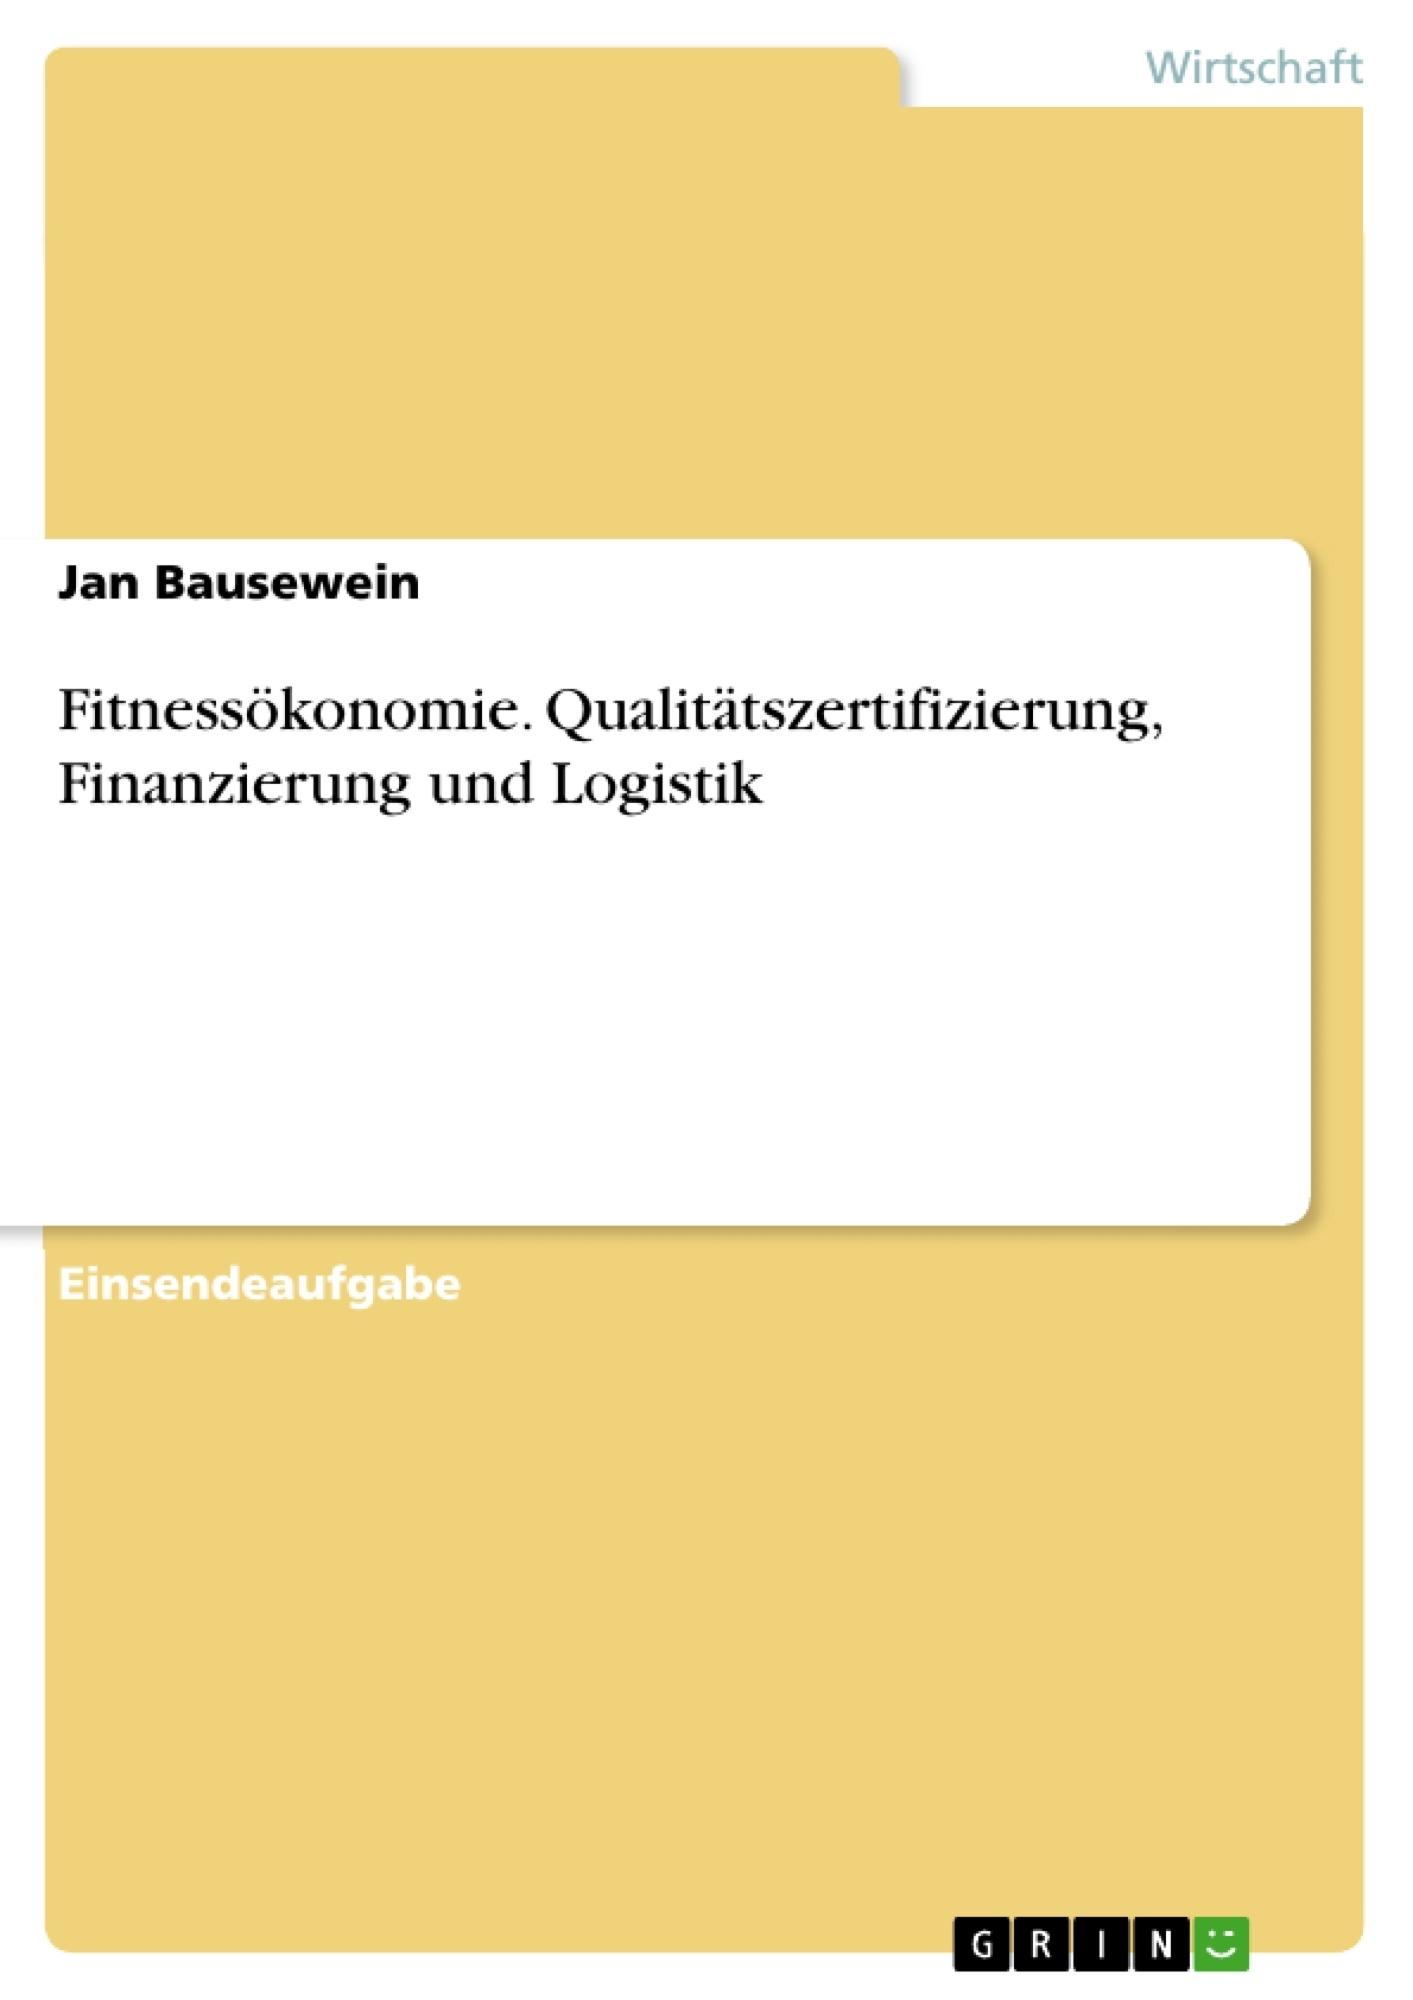 Titel: Fitnessökonomie. Qualitätszertifizierung, Finanzierung und Logistik